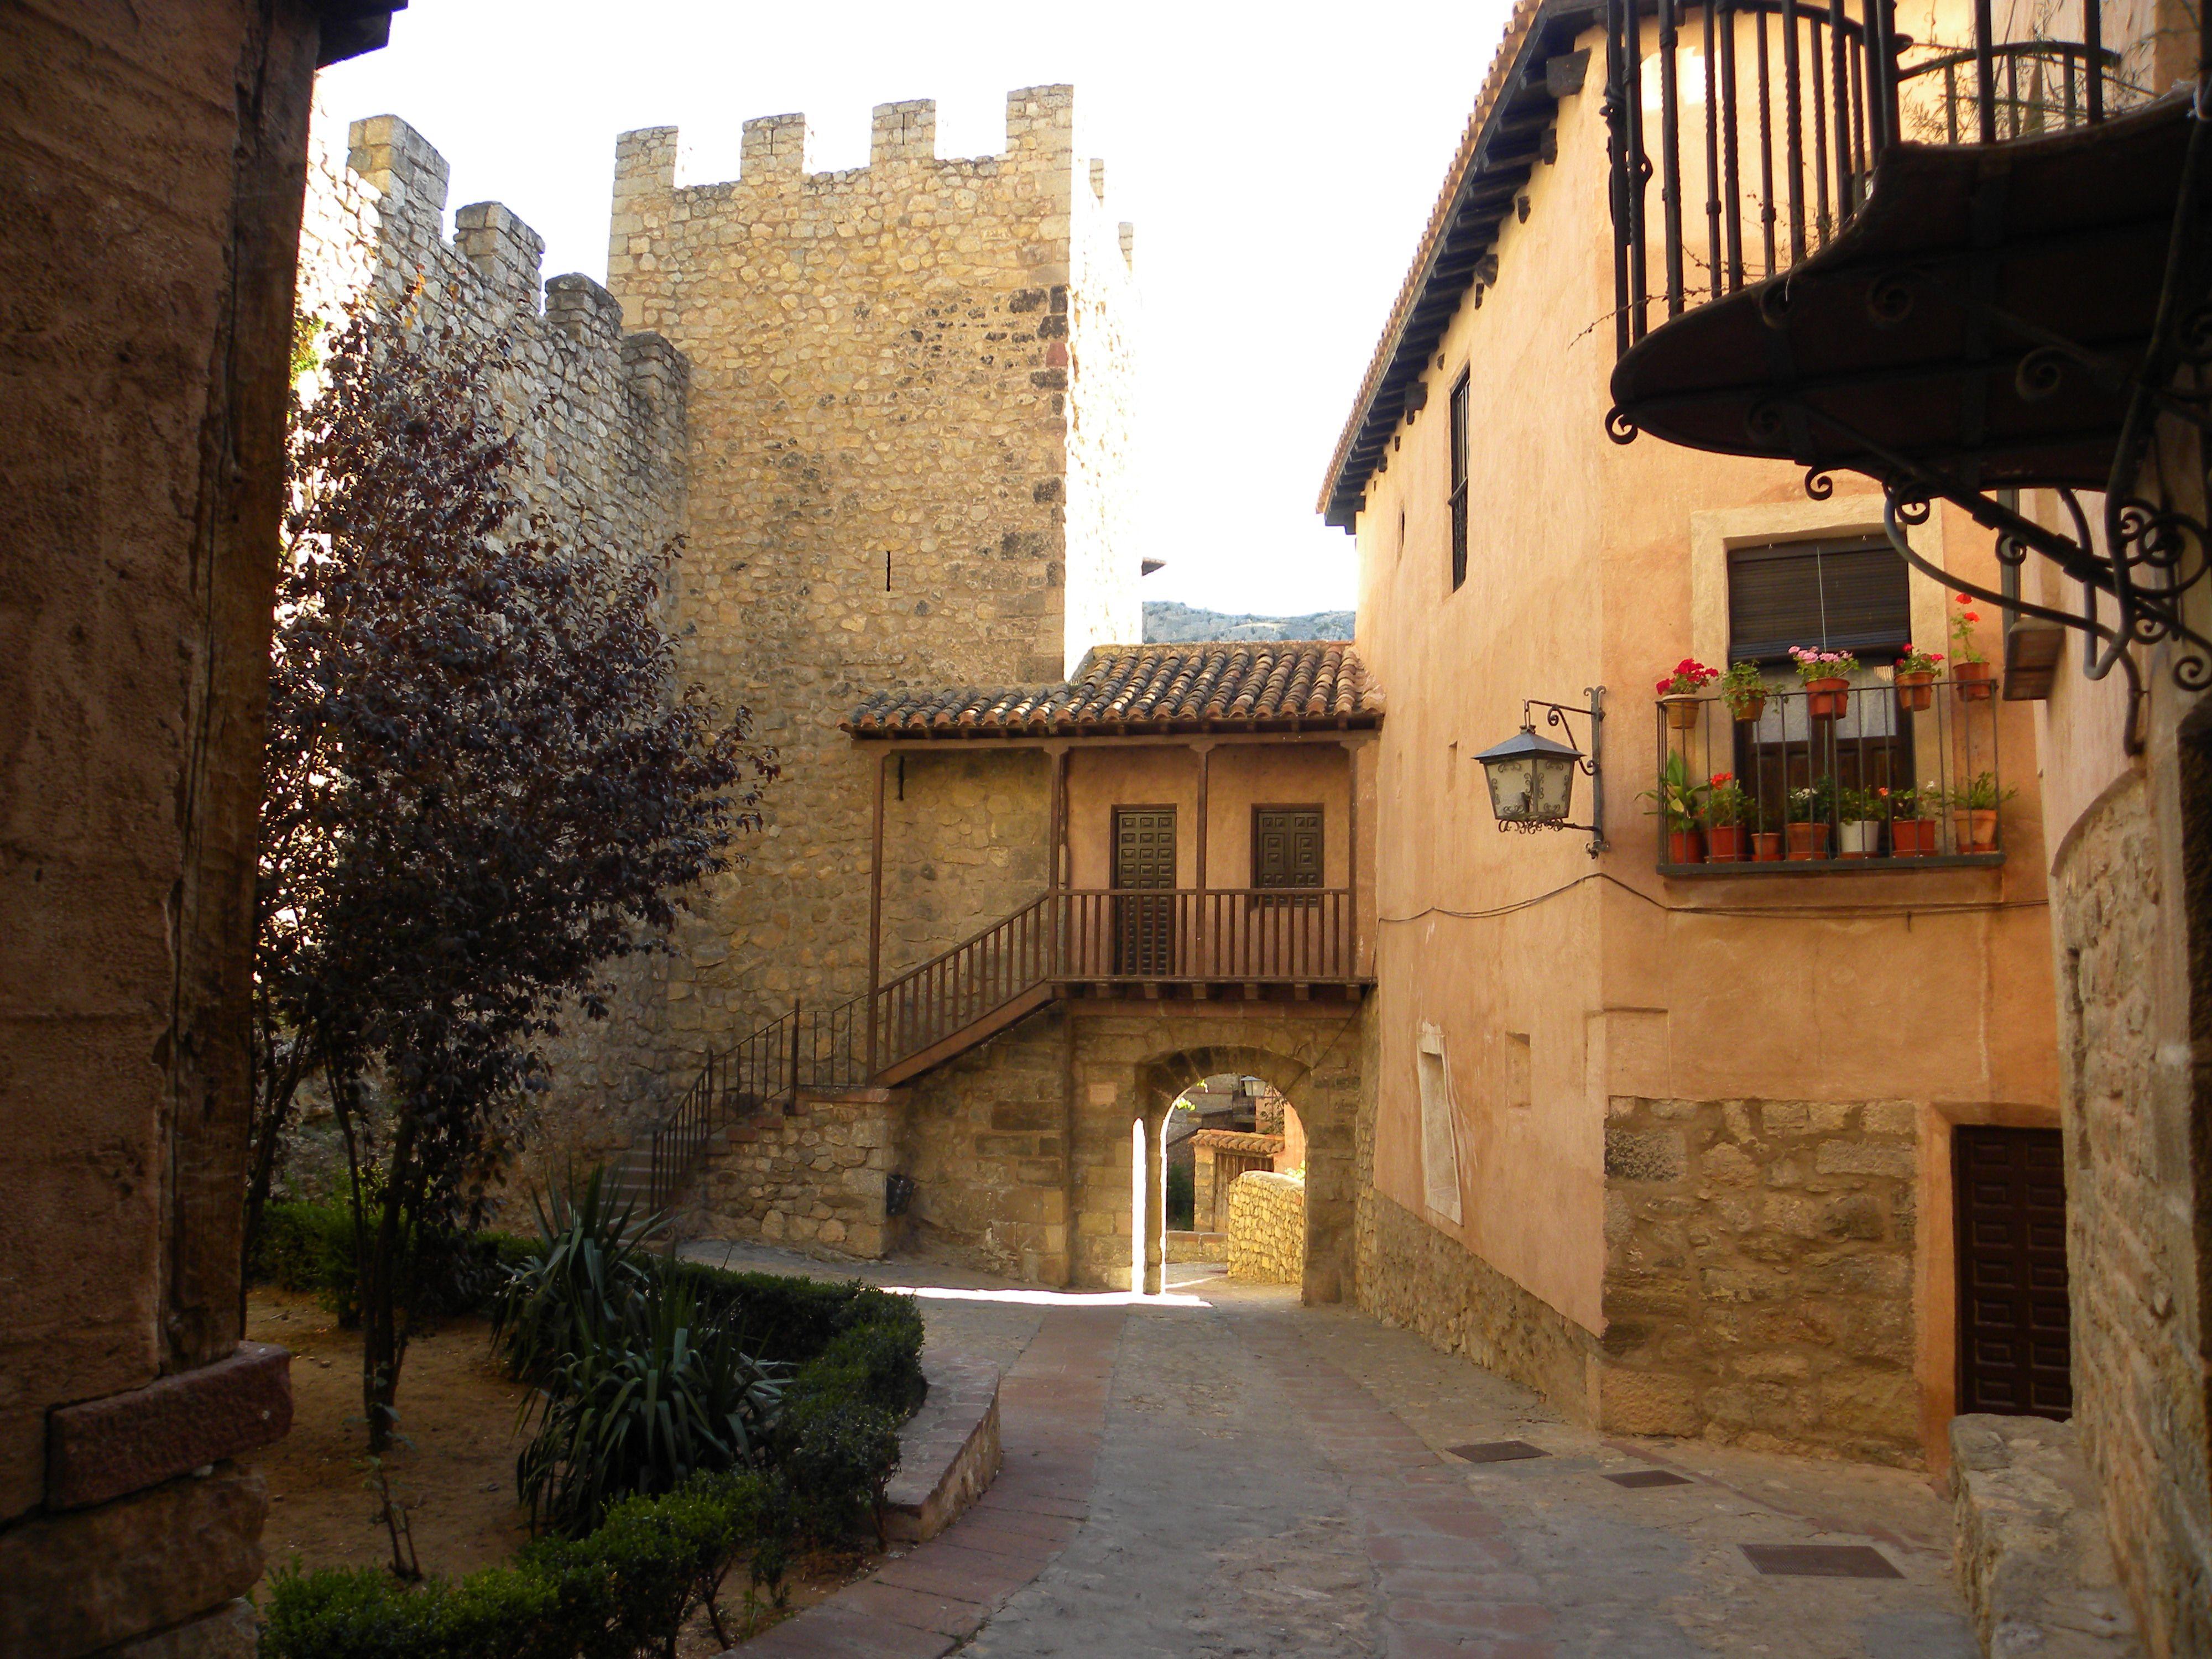 dba954555b976 Murallas de Albarracin